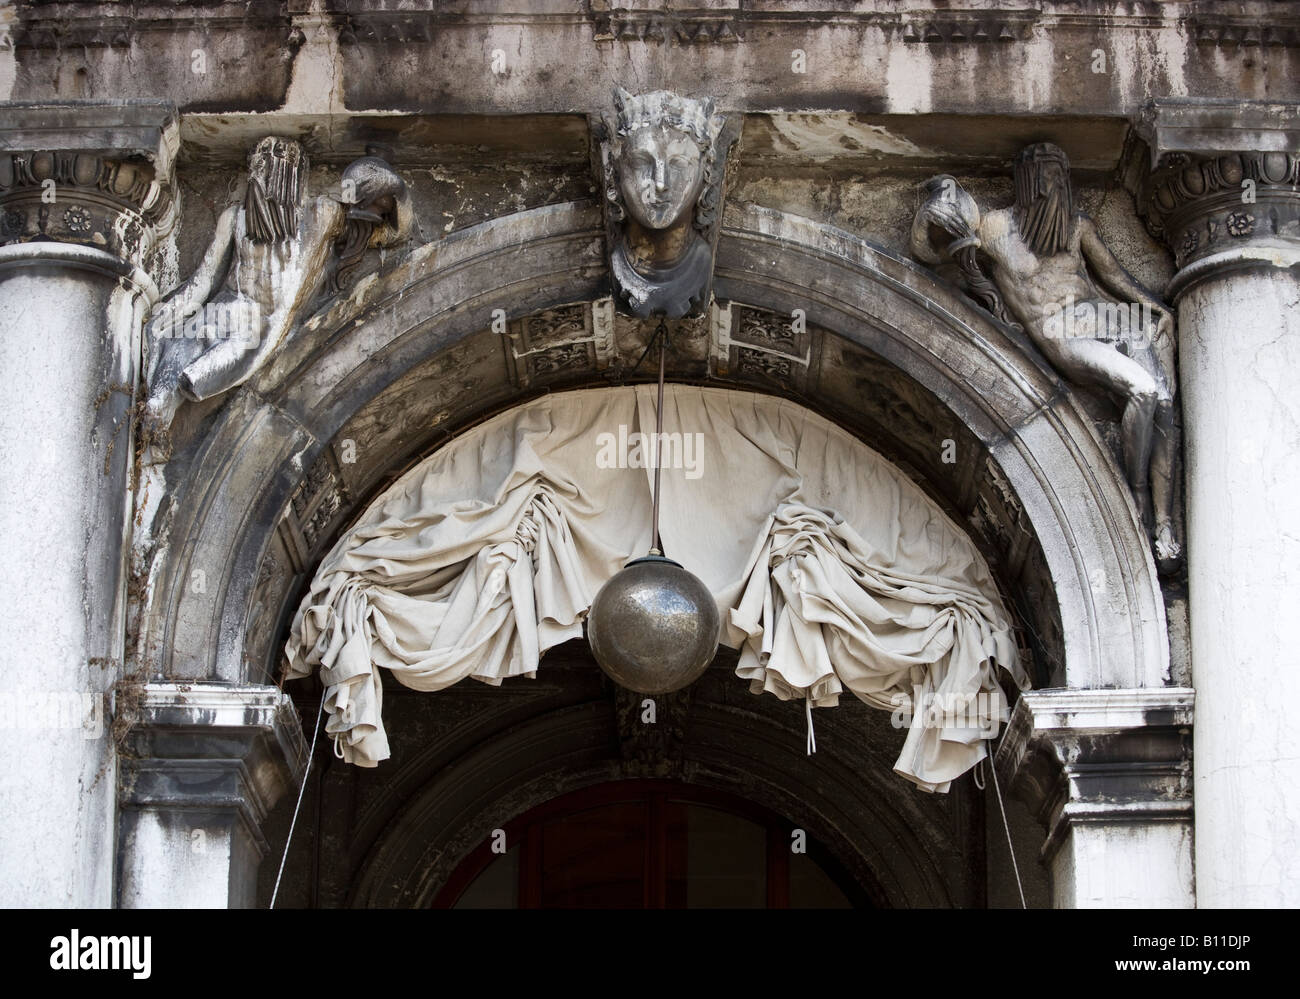 Venedig, Markusplatz (Piazza San Marco), Kolonnadenbogen - Stock Image